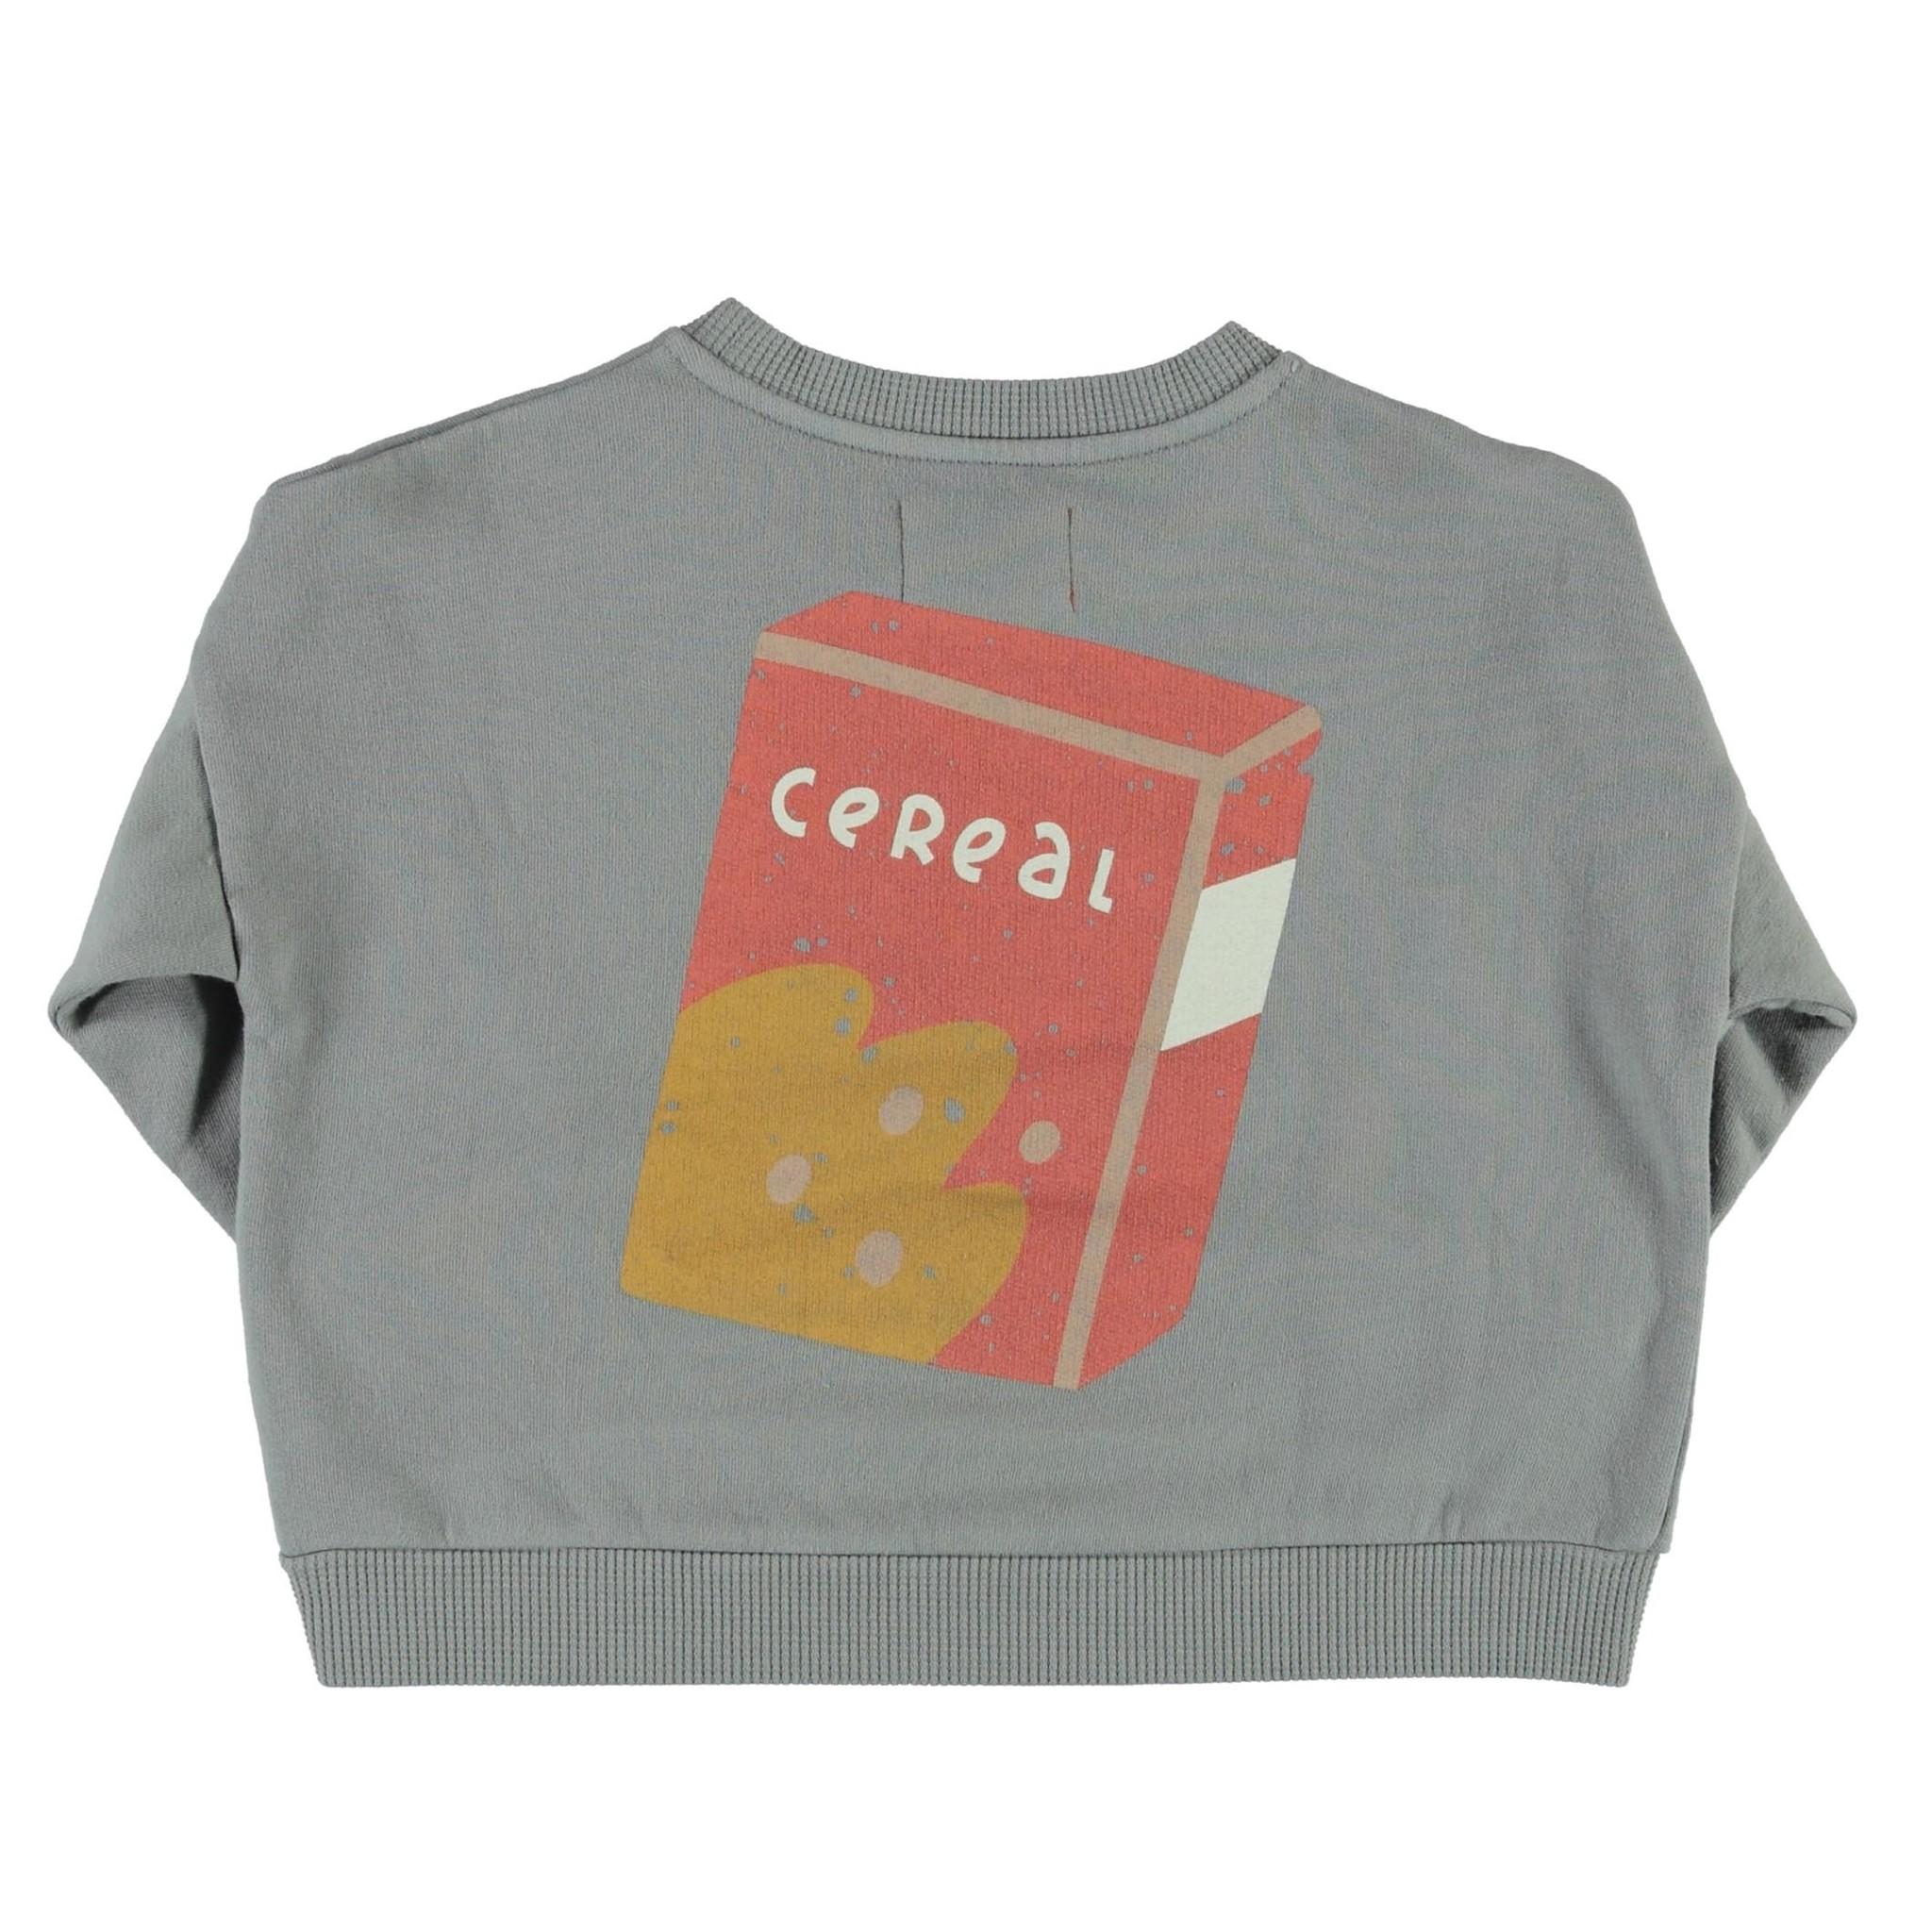 unisex sweatshirt   grey w/ cereal box print-2